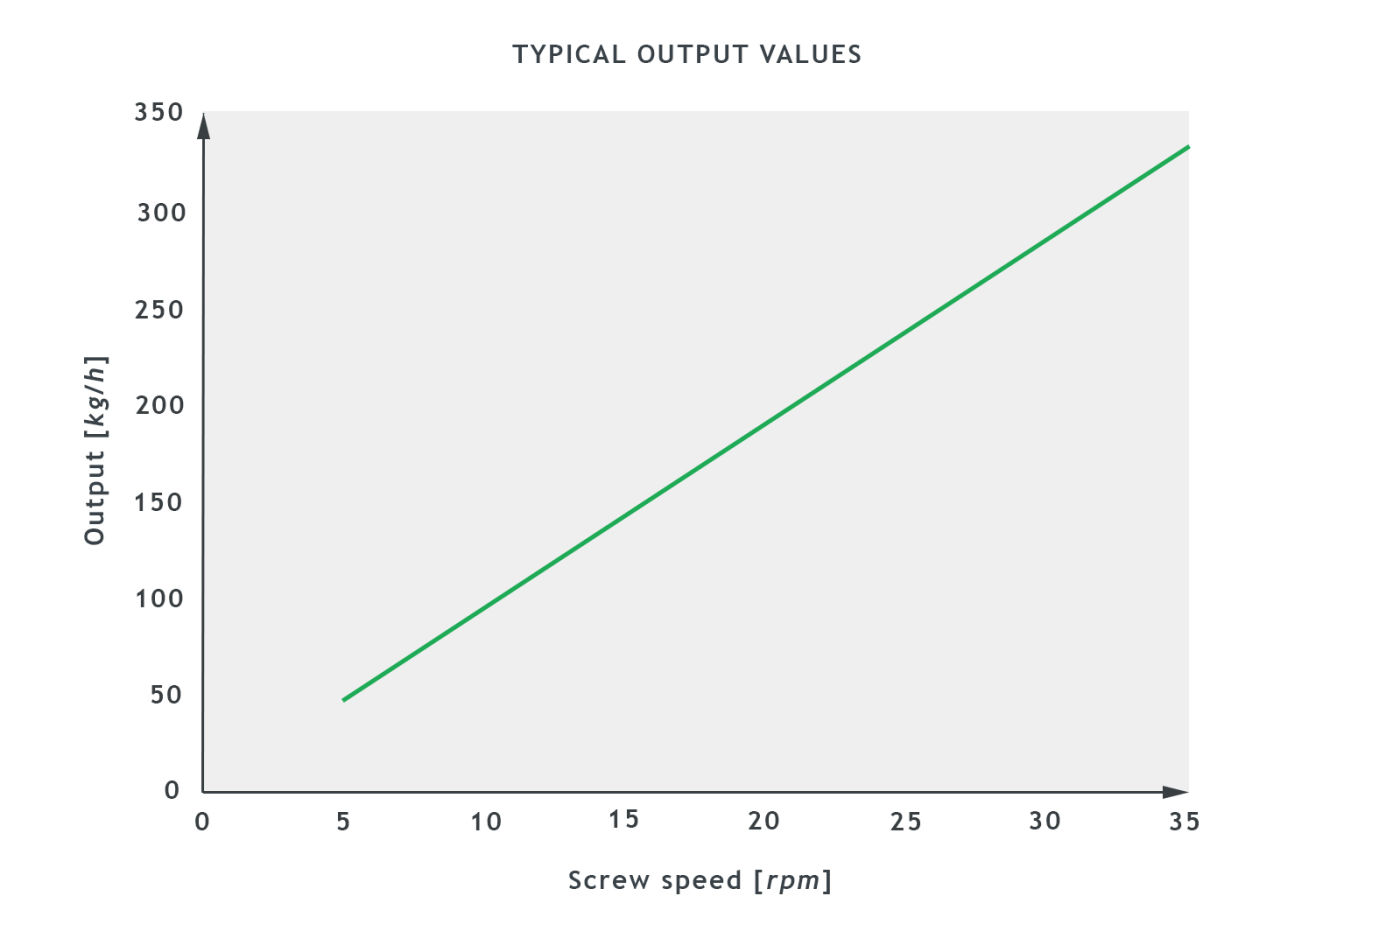 MXI150_24D_SB0102151_Output_graph1.jpg